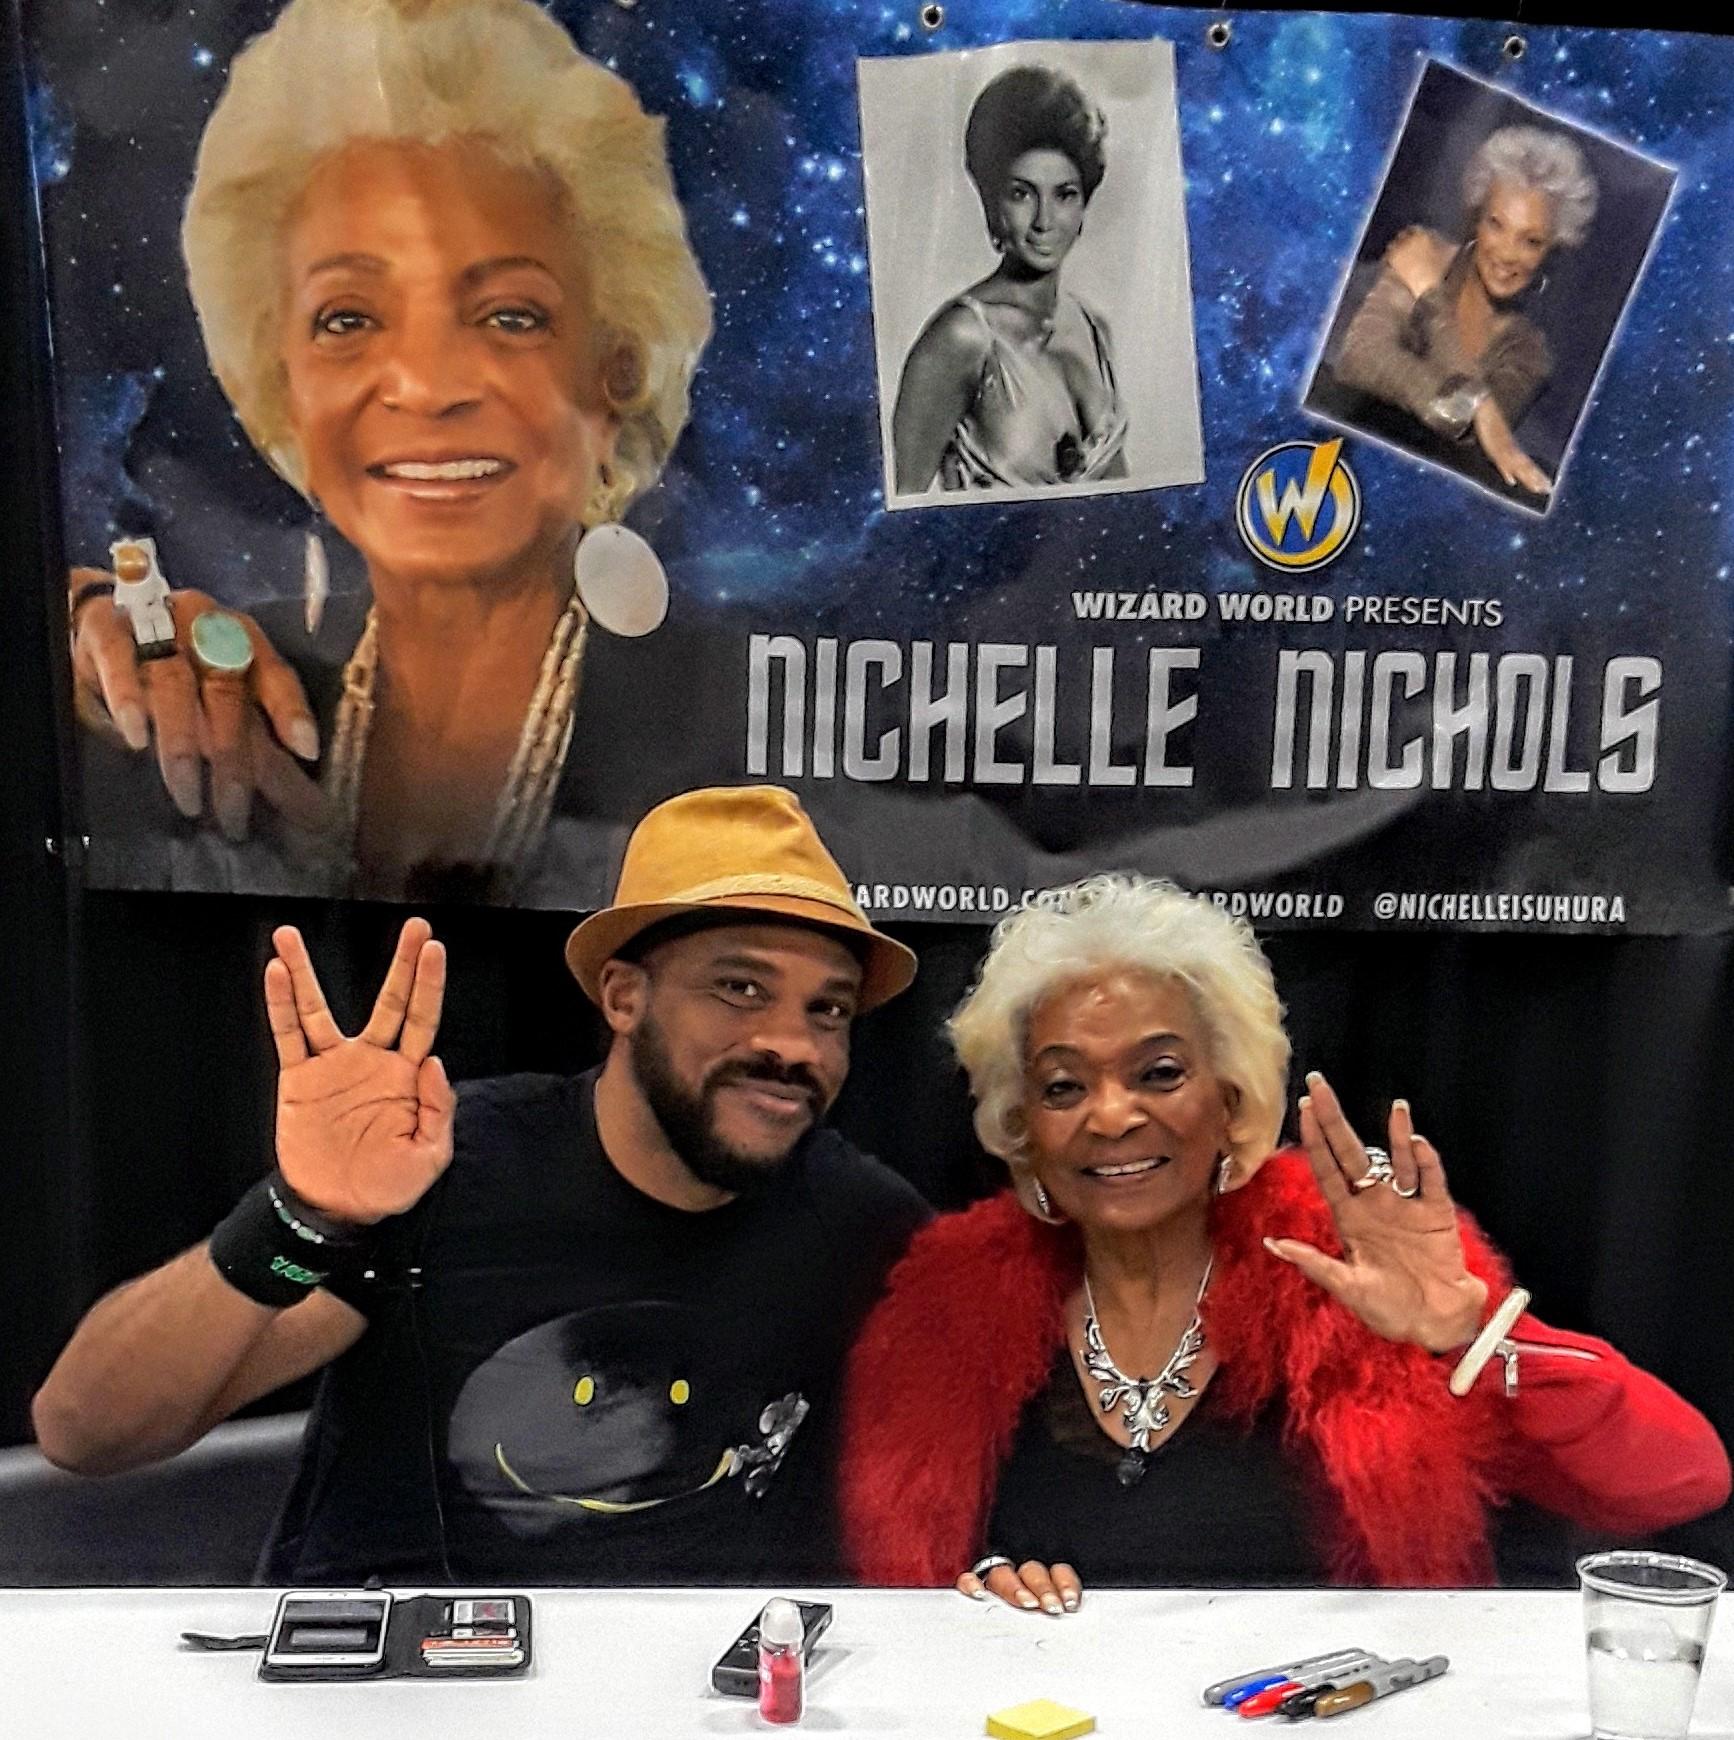 R. Alan Brooks  with  Nichelle Nichols  at Wizard World Des Moines 2018.